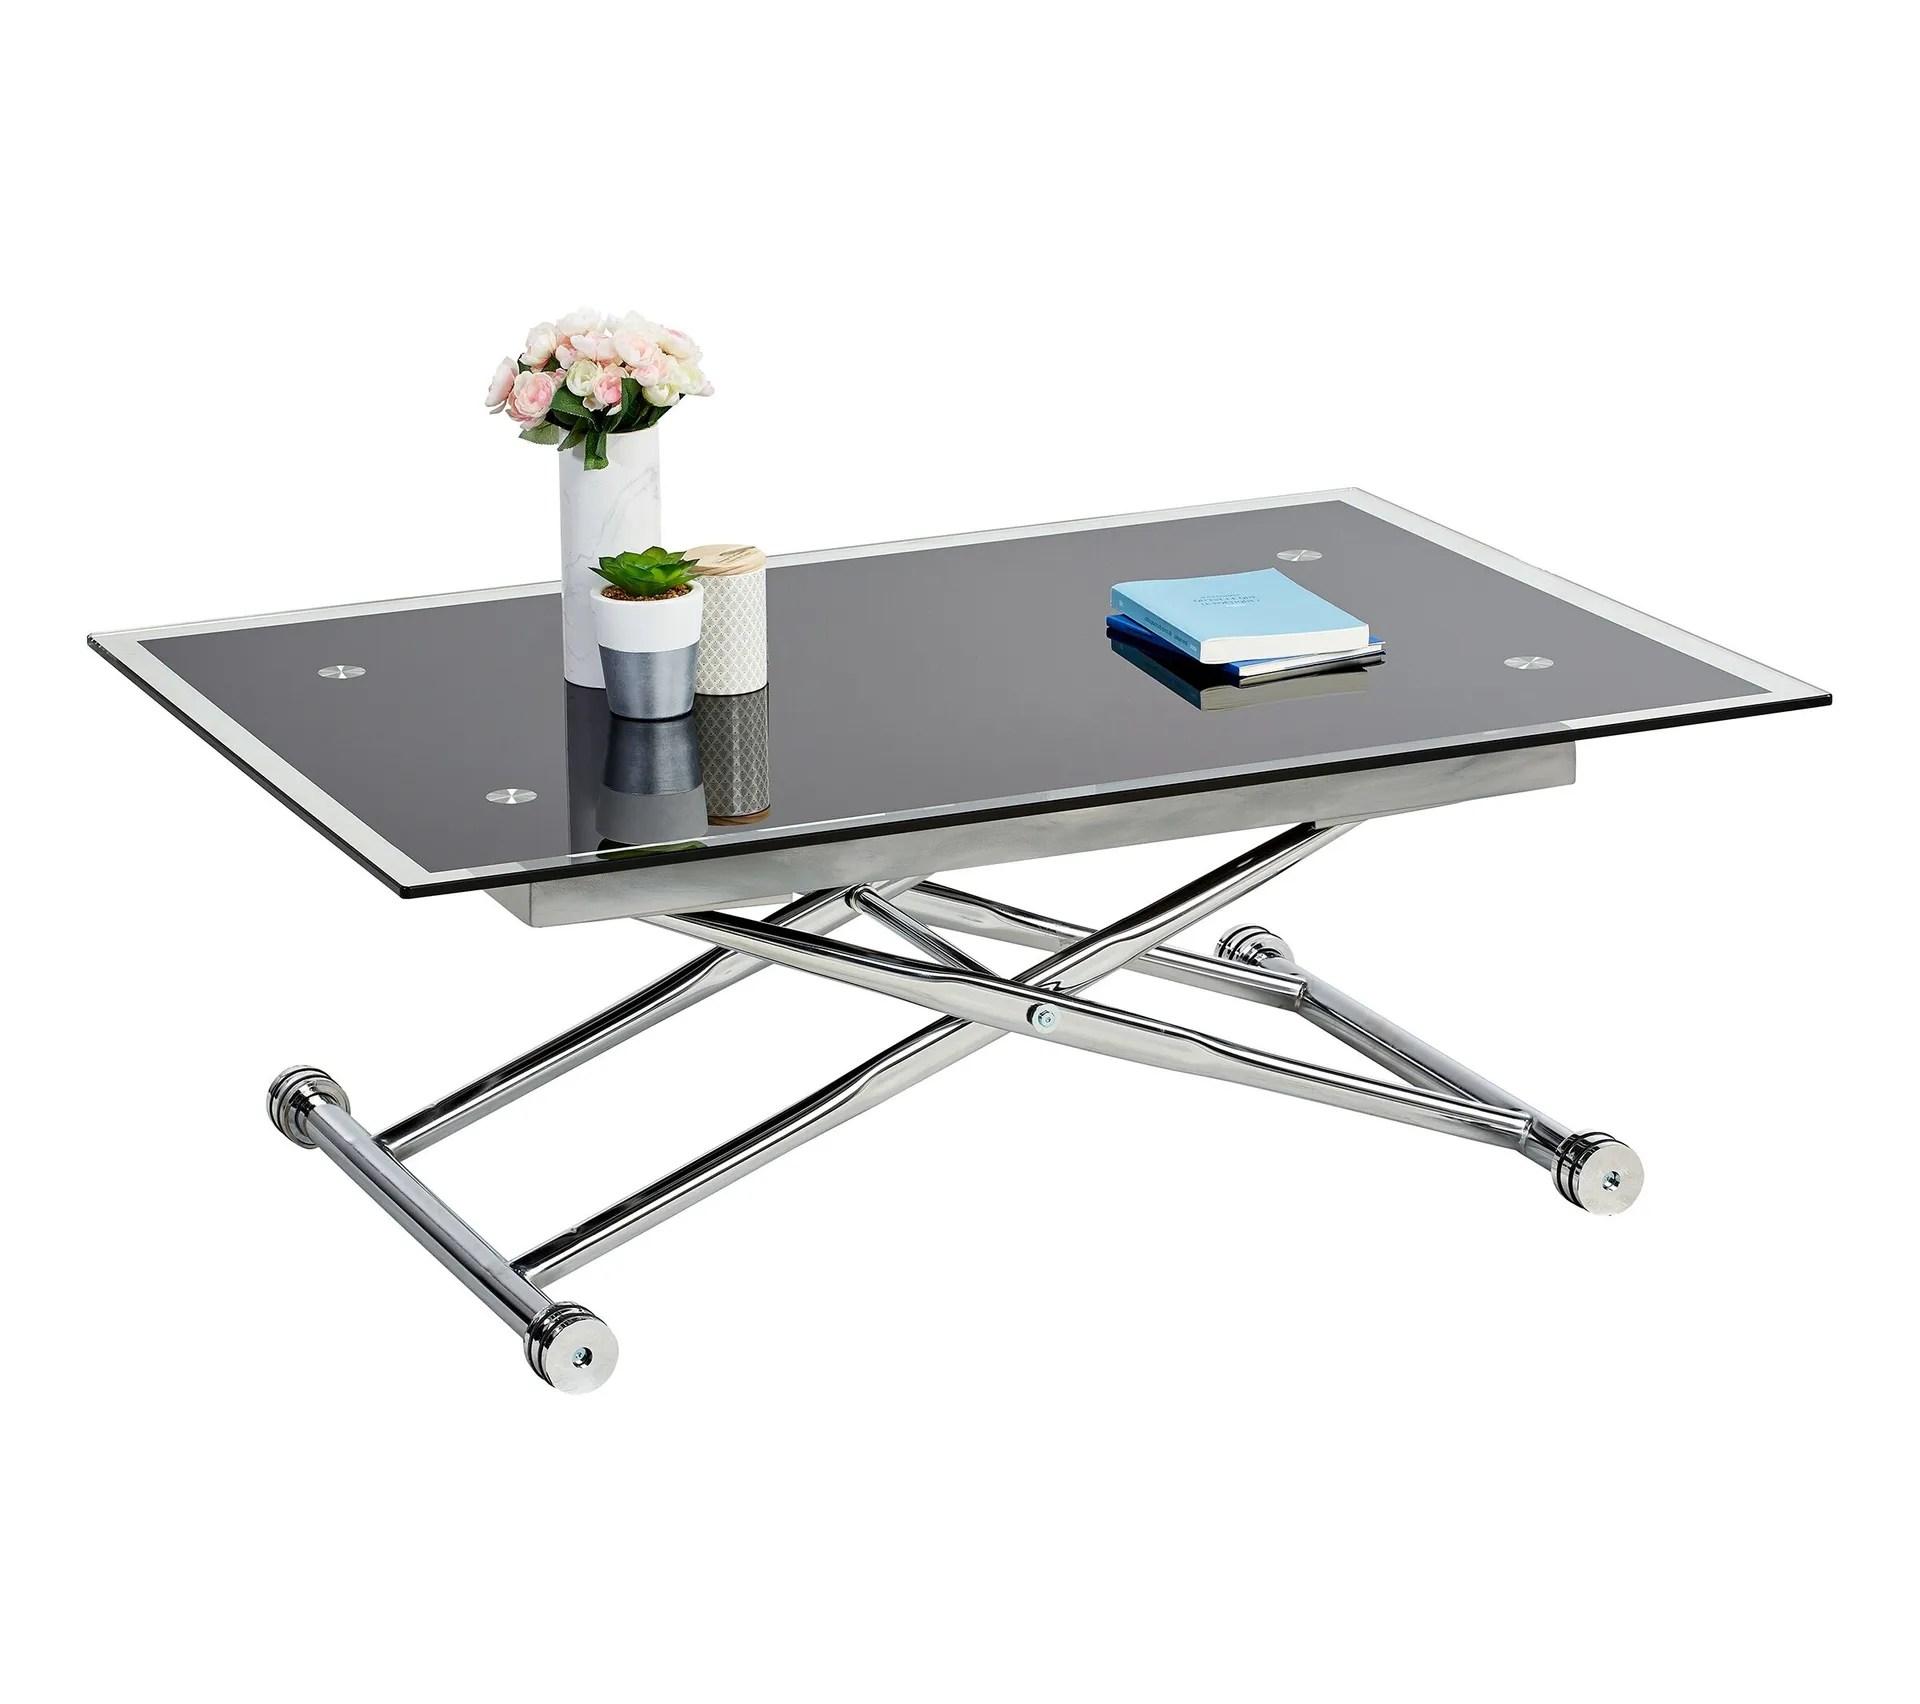 table basse relevable up down 2 verre et chrome